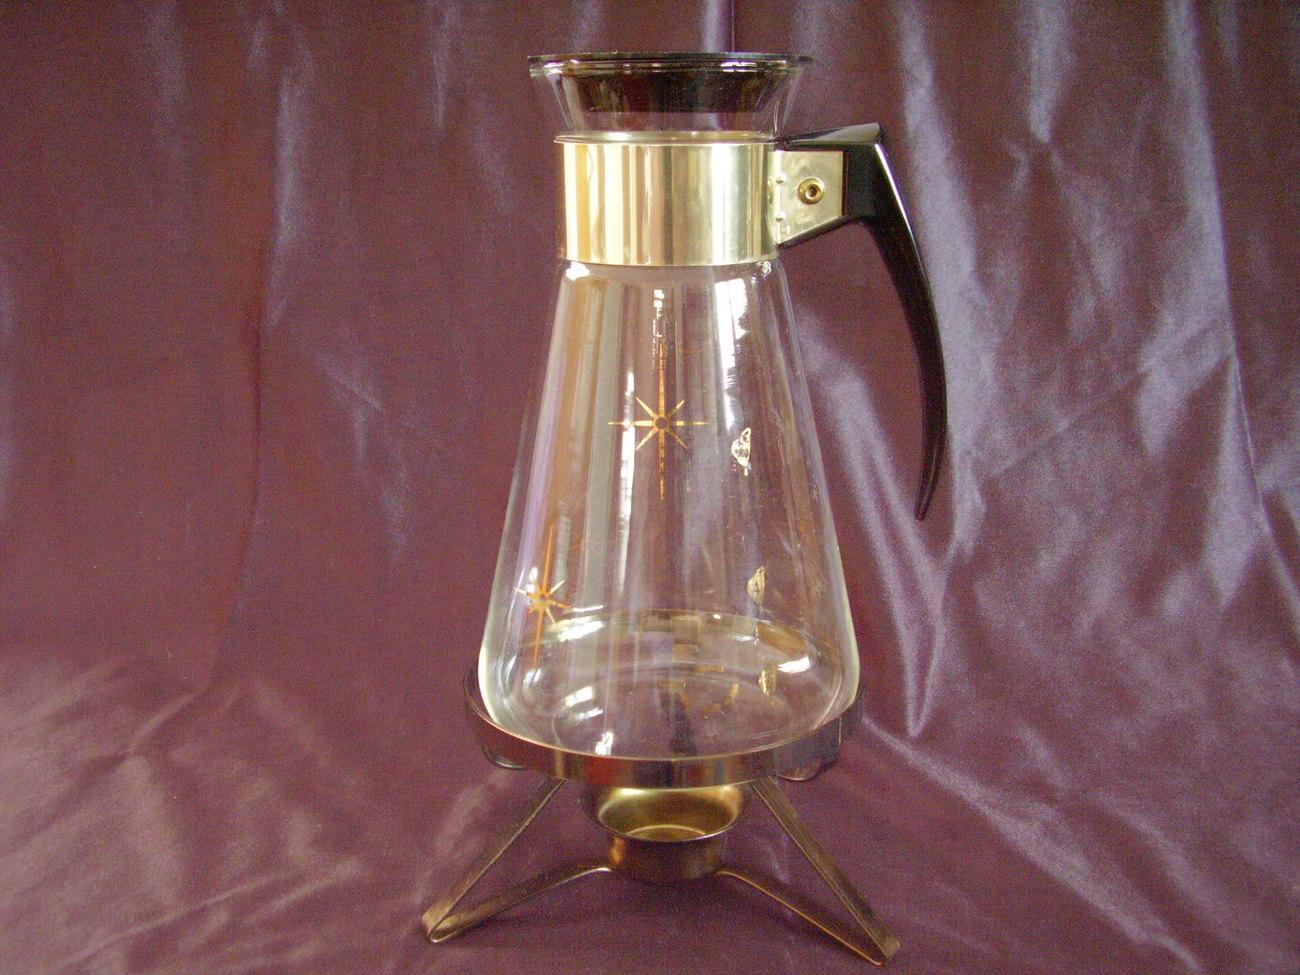 Retro MidCentury Starburst Glass Corning Coffee Carafe Warming Stand - $19.99